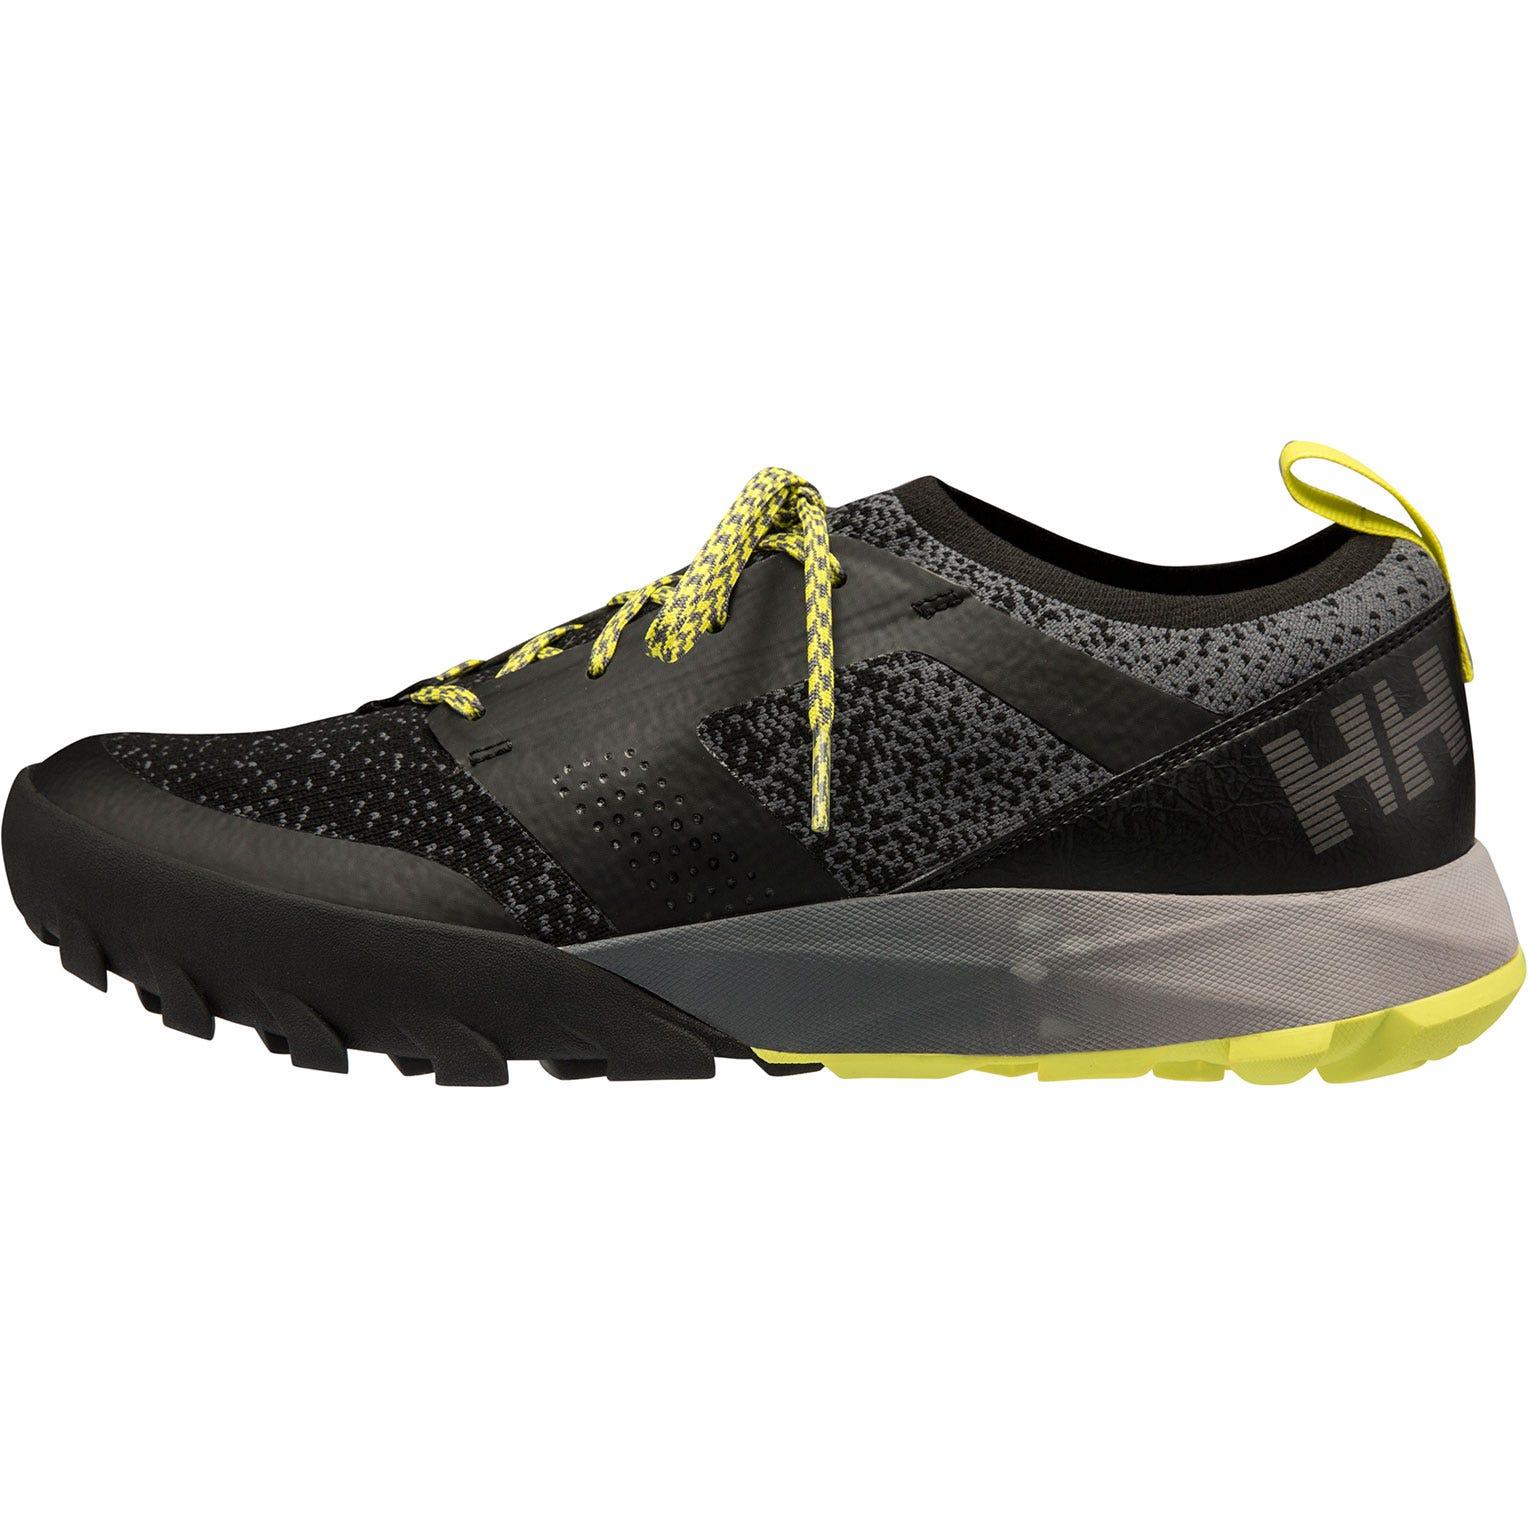 Helly Hansen Loke Dash Mens Hiking Boot Black 48/13